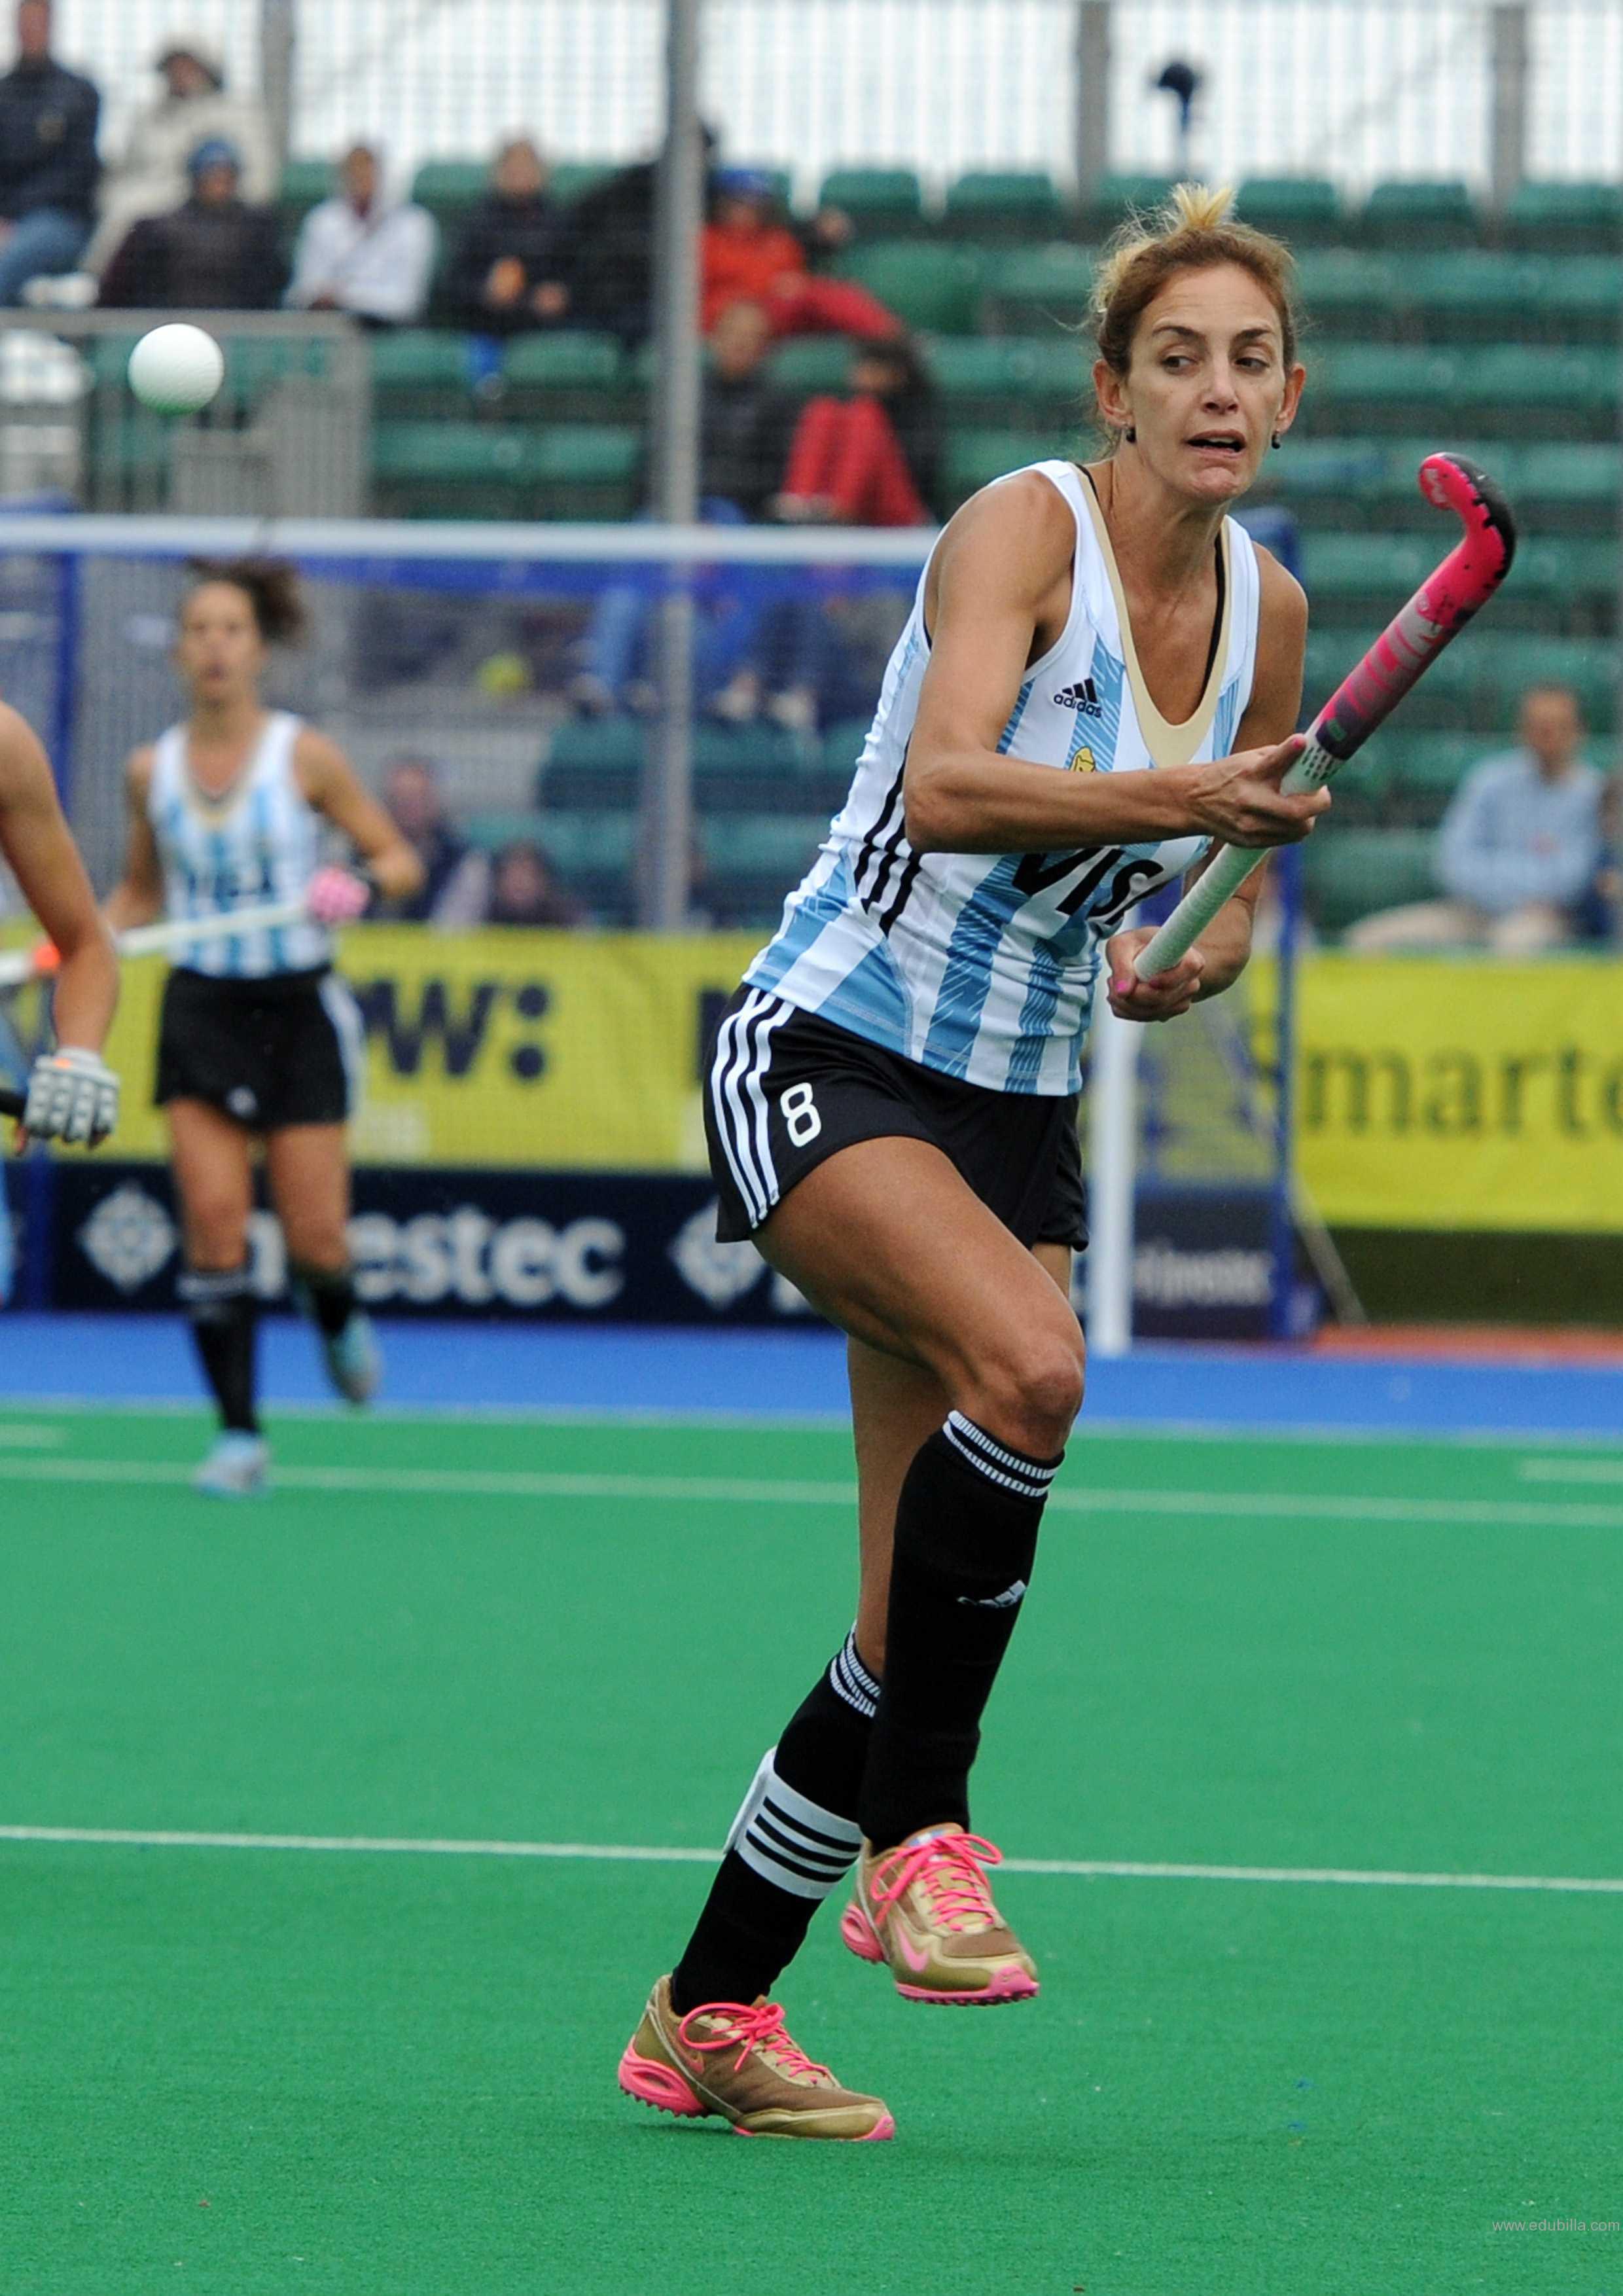 Luciana Aymar 4 Olympic medals